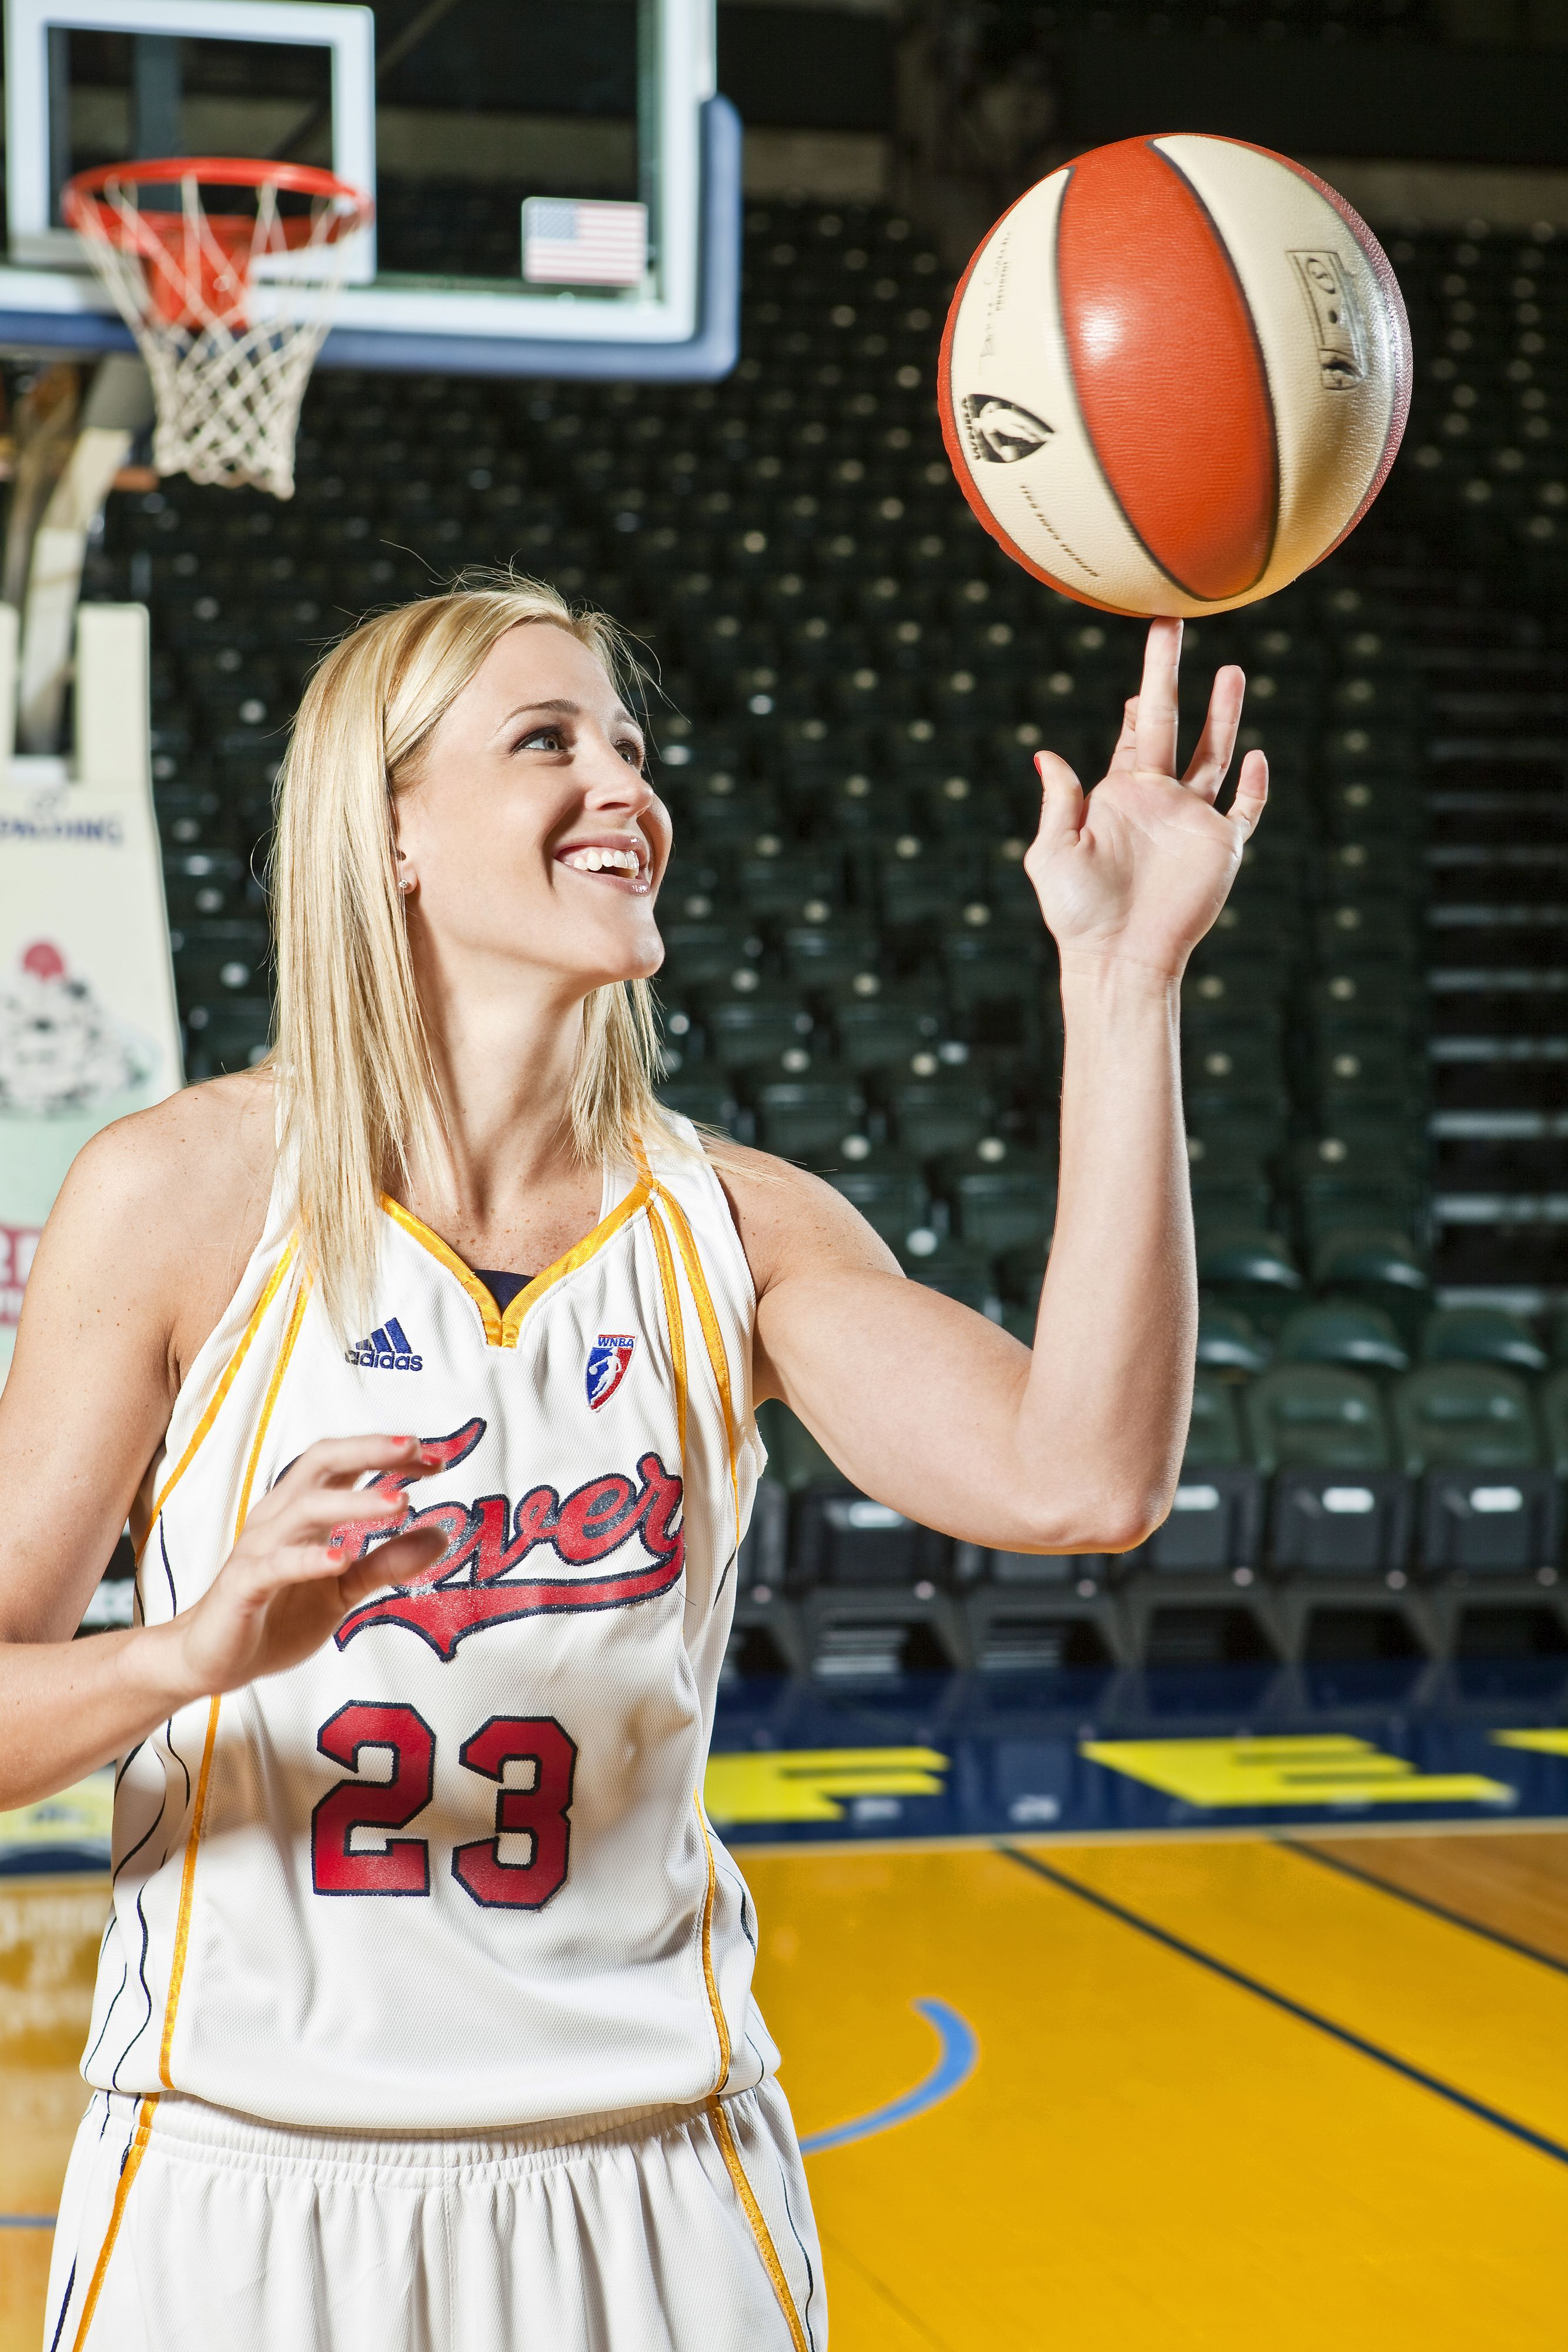 She S A Rock Star Dance Tops Bras Indiana Basketball Sports